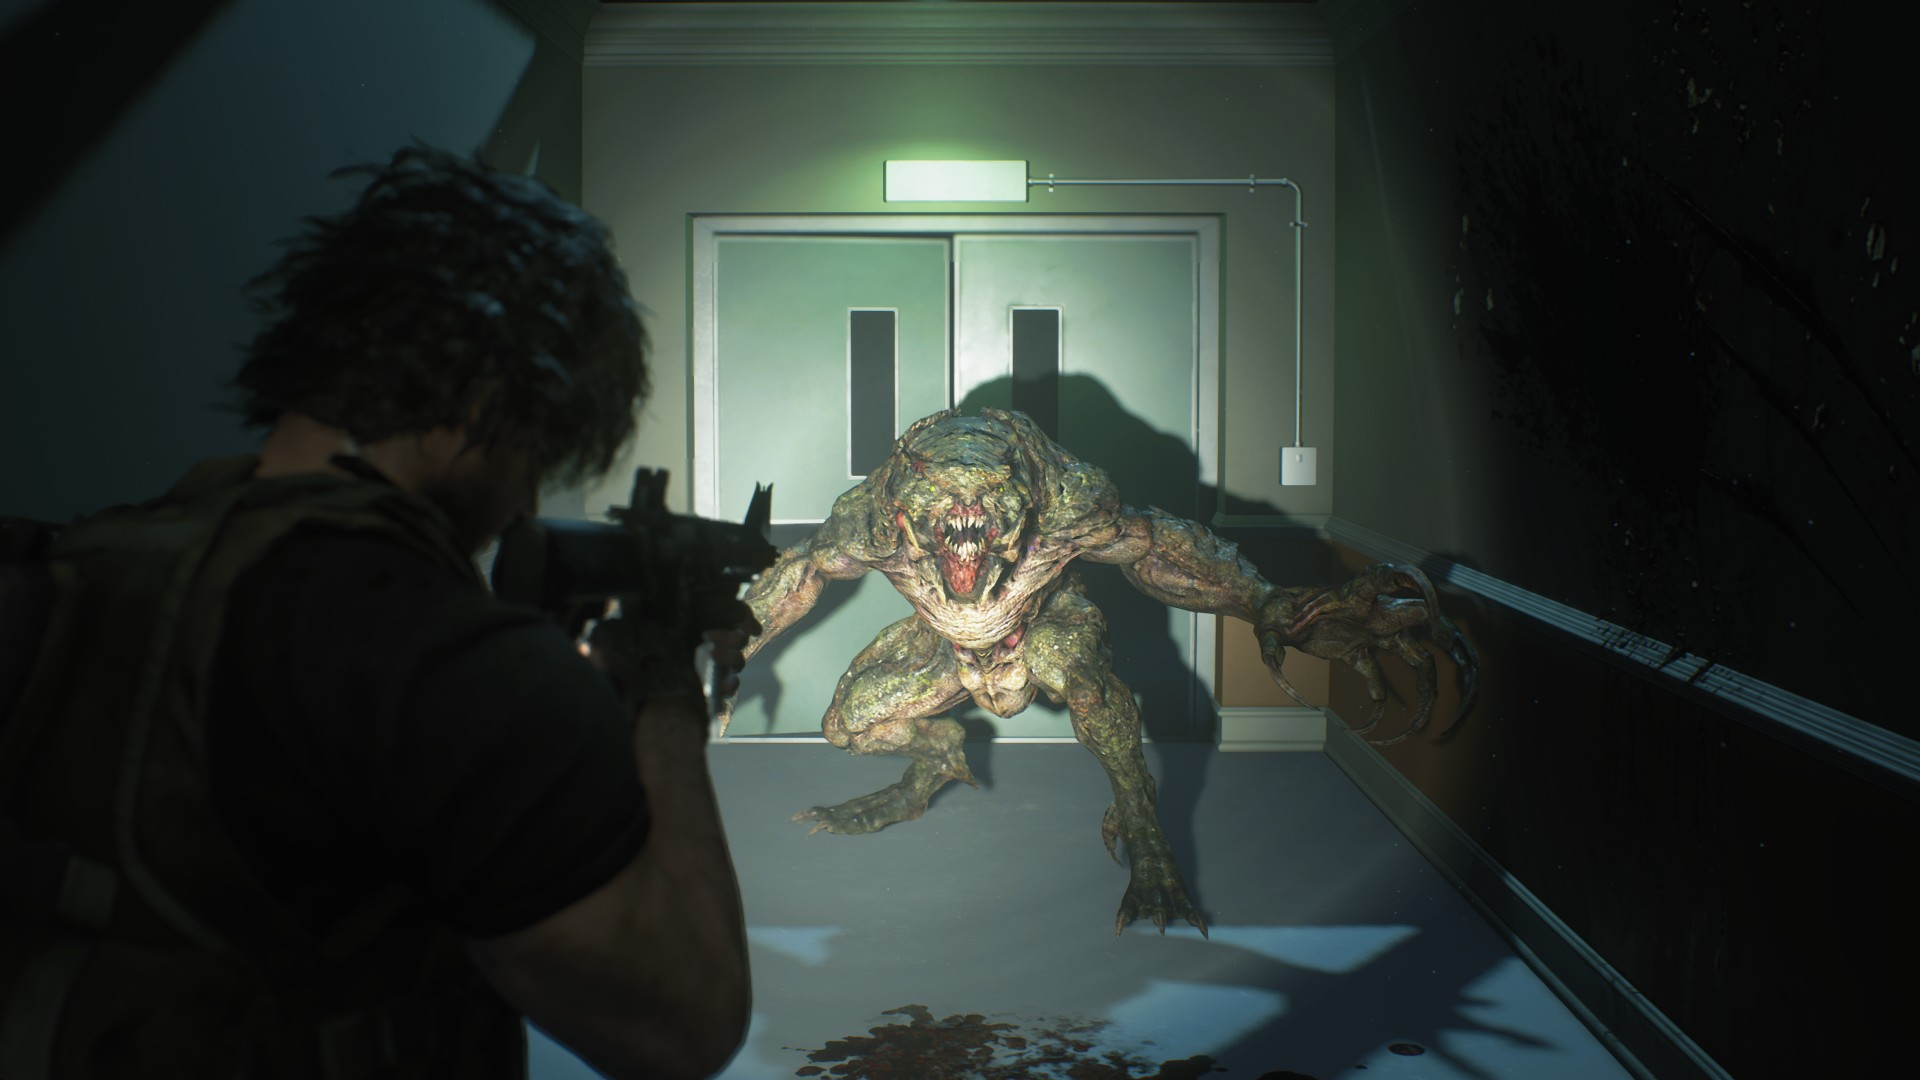 New Resident Evil 3 Remake Screenshots Show Off Nemesis Alongside